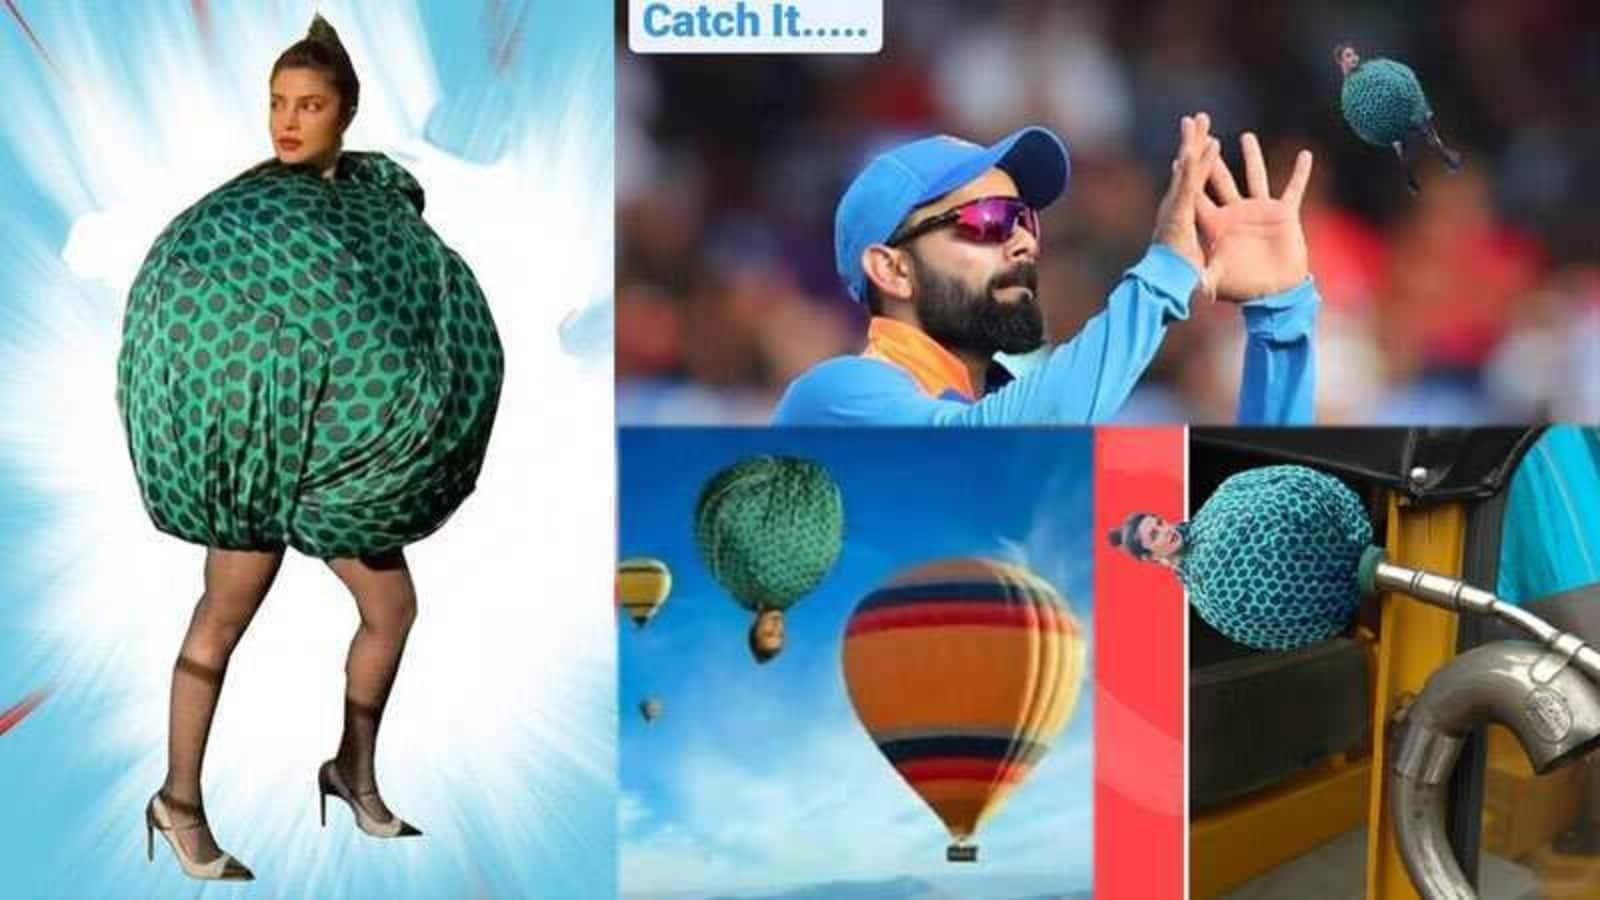 Priyanka Chopra can't stop laughing over 'boriya bistar' memes on her dress, even Virat Kohli is a part of them - Hindustan Times